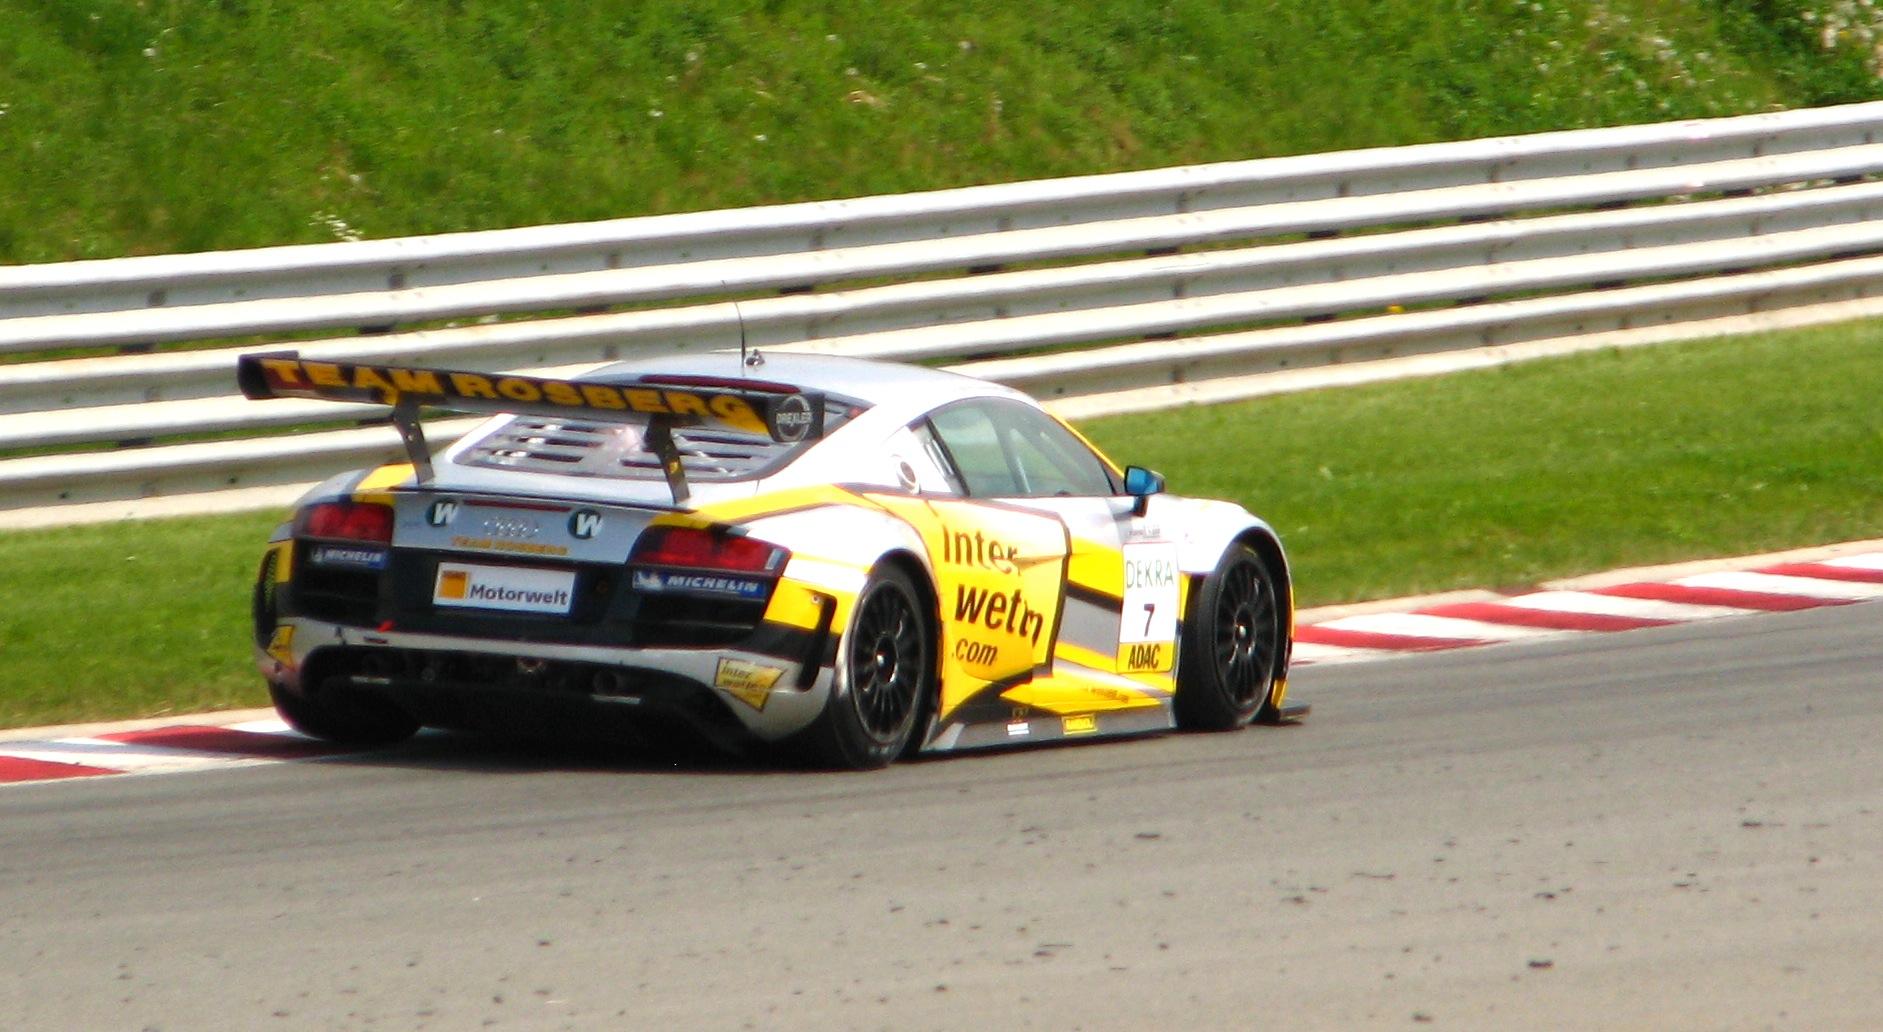 Audi R8 Wiki >> File:Rosberg Audi R8 ADAC GT.jpg - Wikimedia Commons